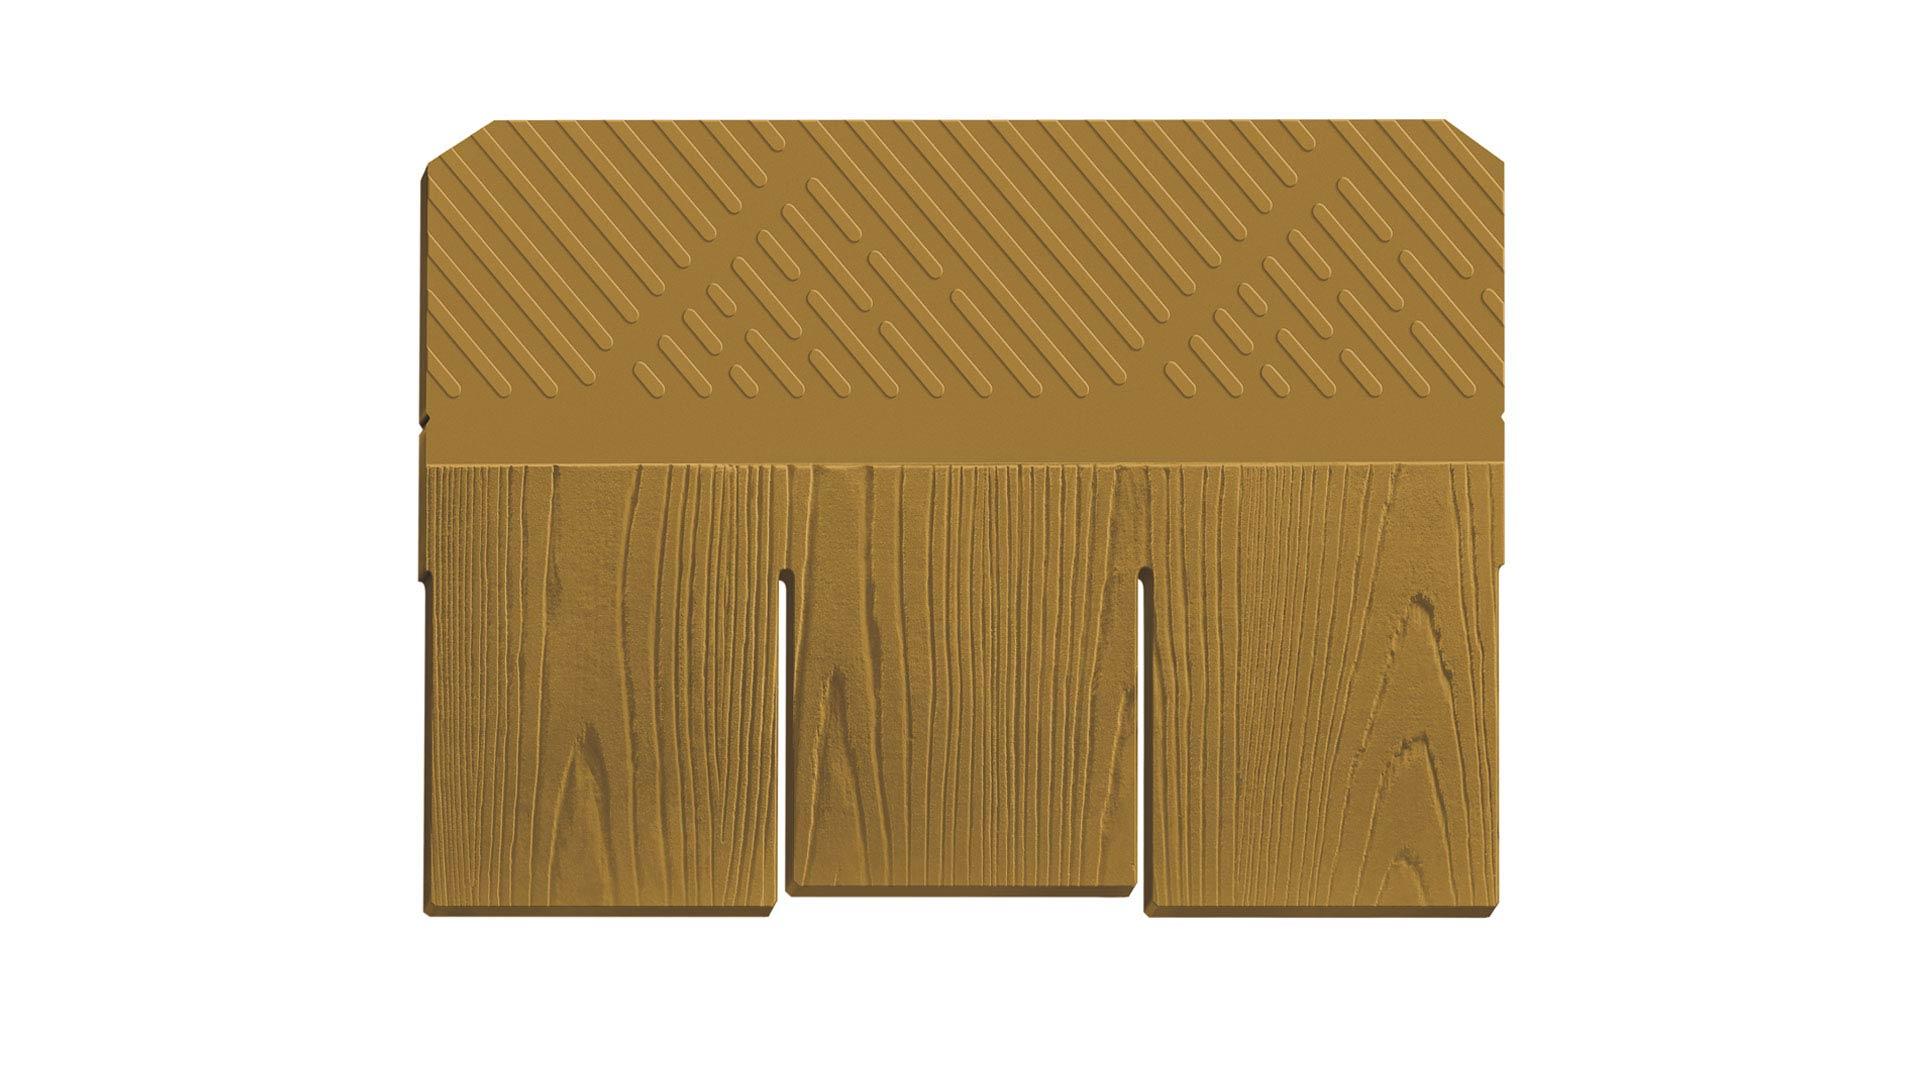 scg-ayara-timber-grain-walnut-brown.jpg